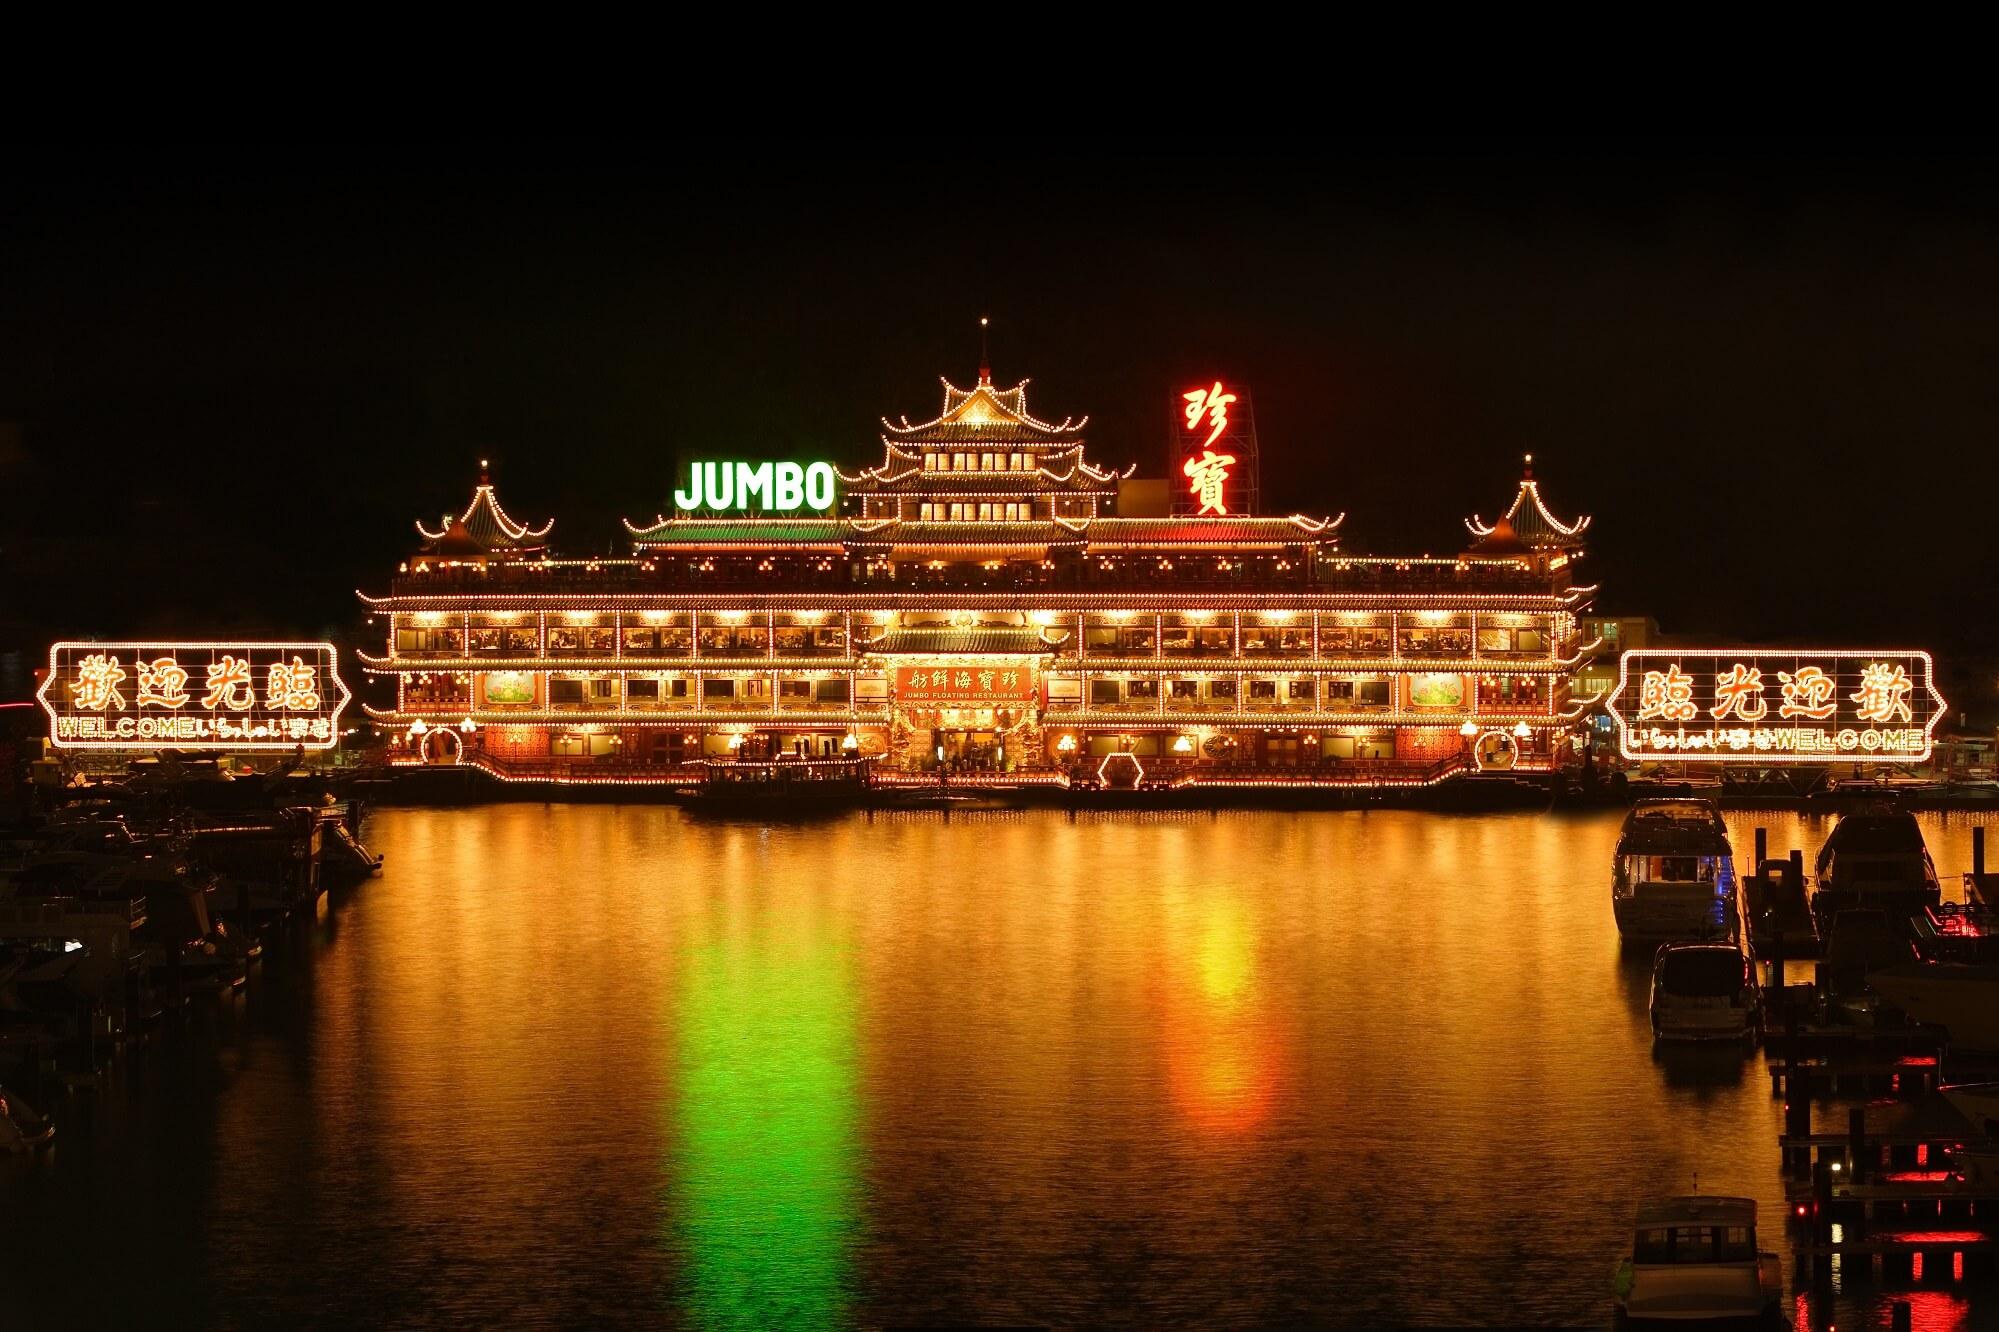 Reflection of Jumbo Kingdom restaurant on water at night